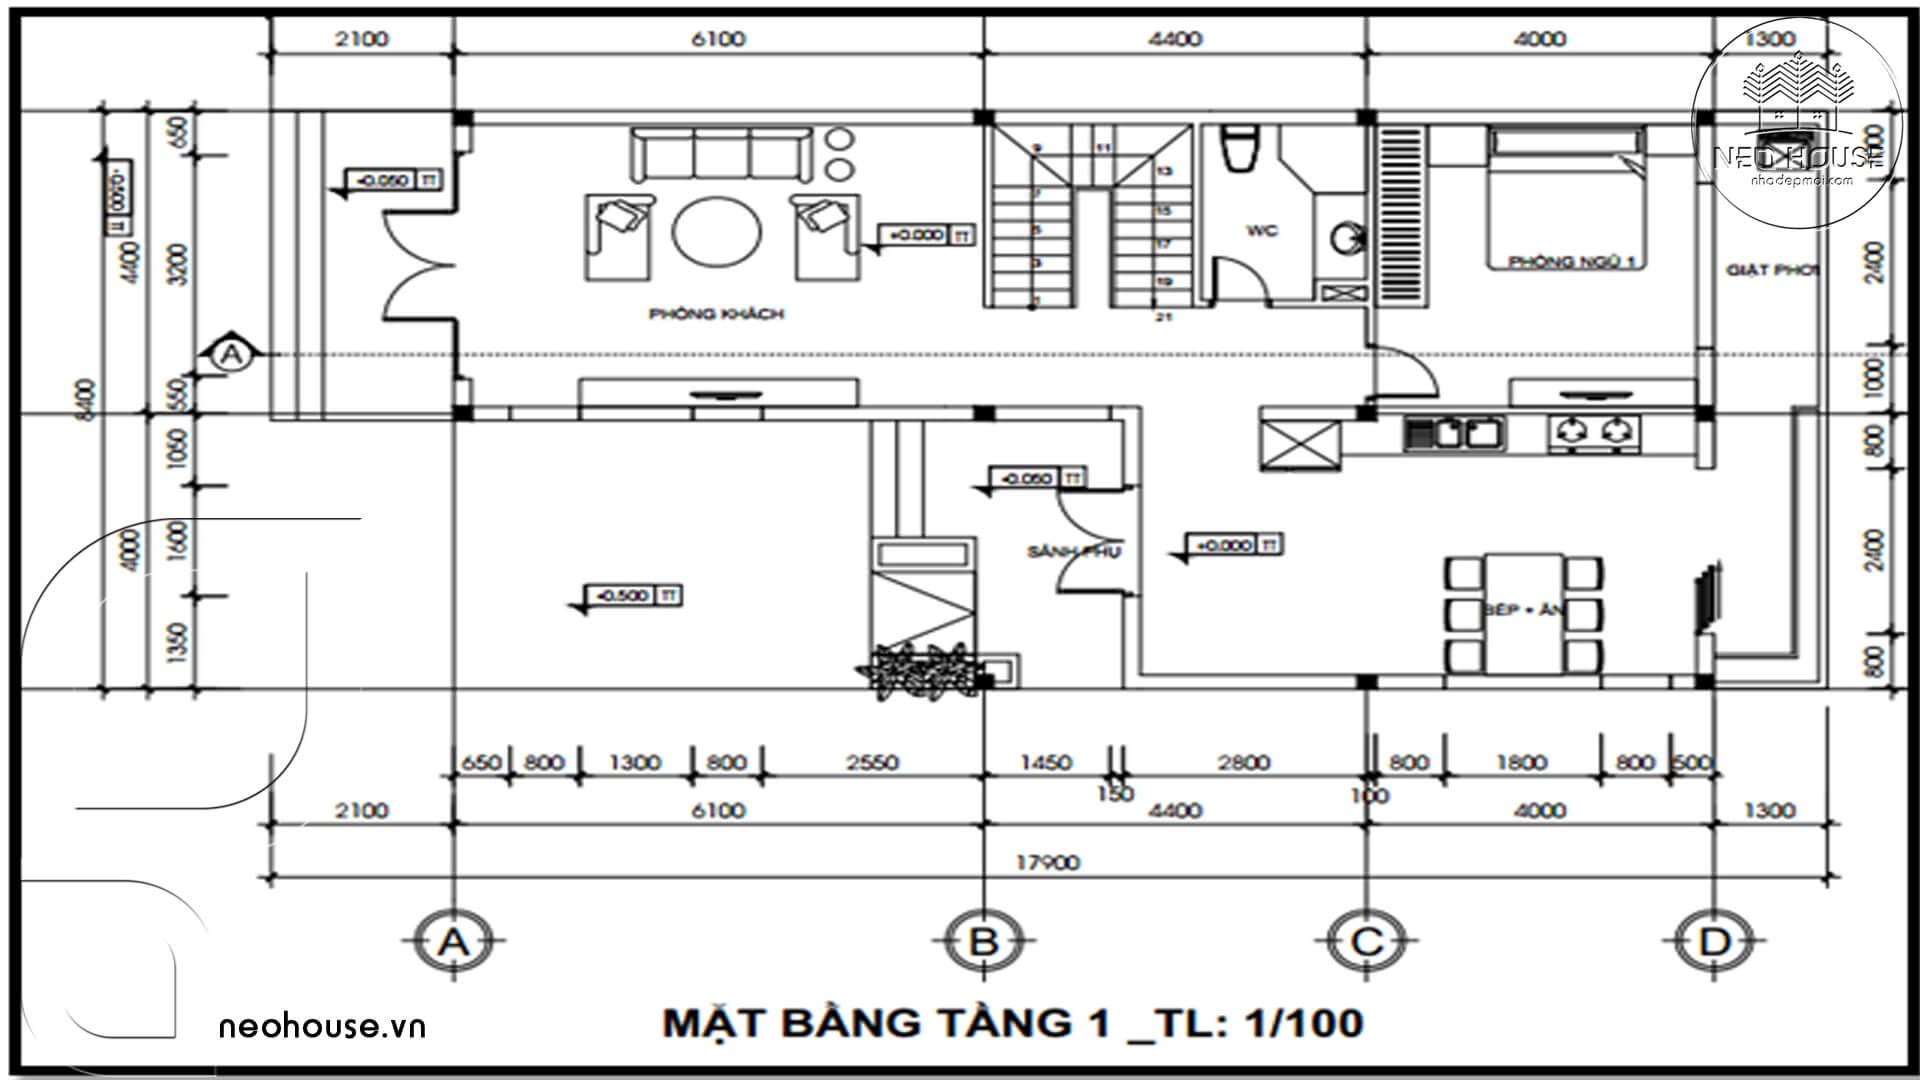 Ban-ve-thiet-ke-biet-thu-vuon-tai-quang-ngai-1.jpg